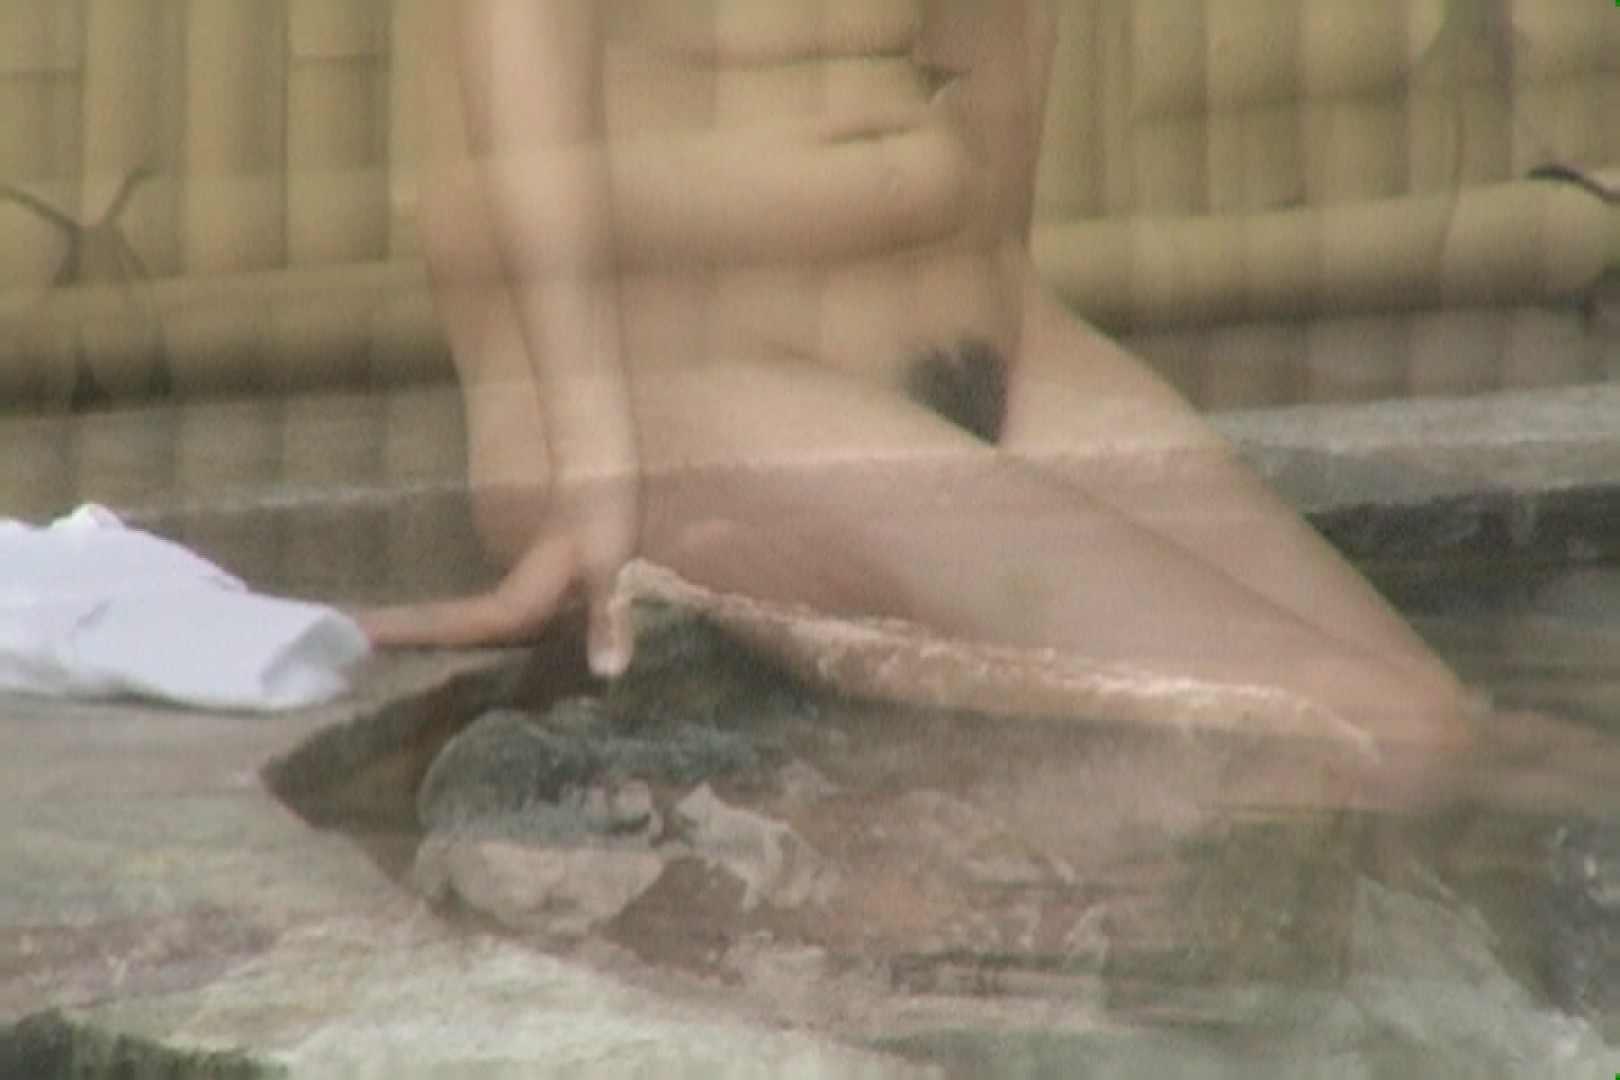 Aquaな露天風呂Vol.629 OLセックス  90画像 36